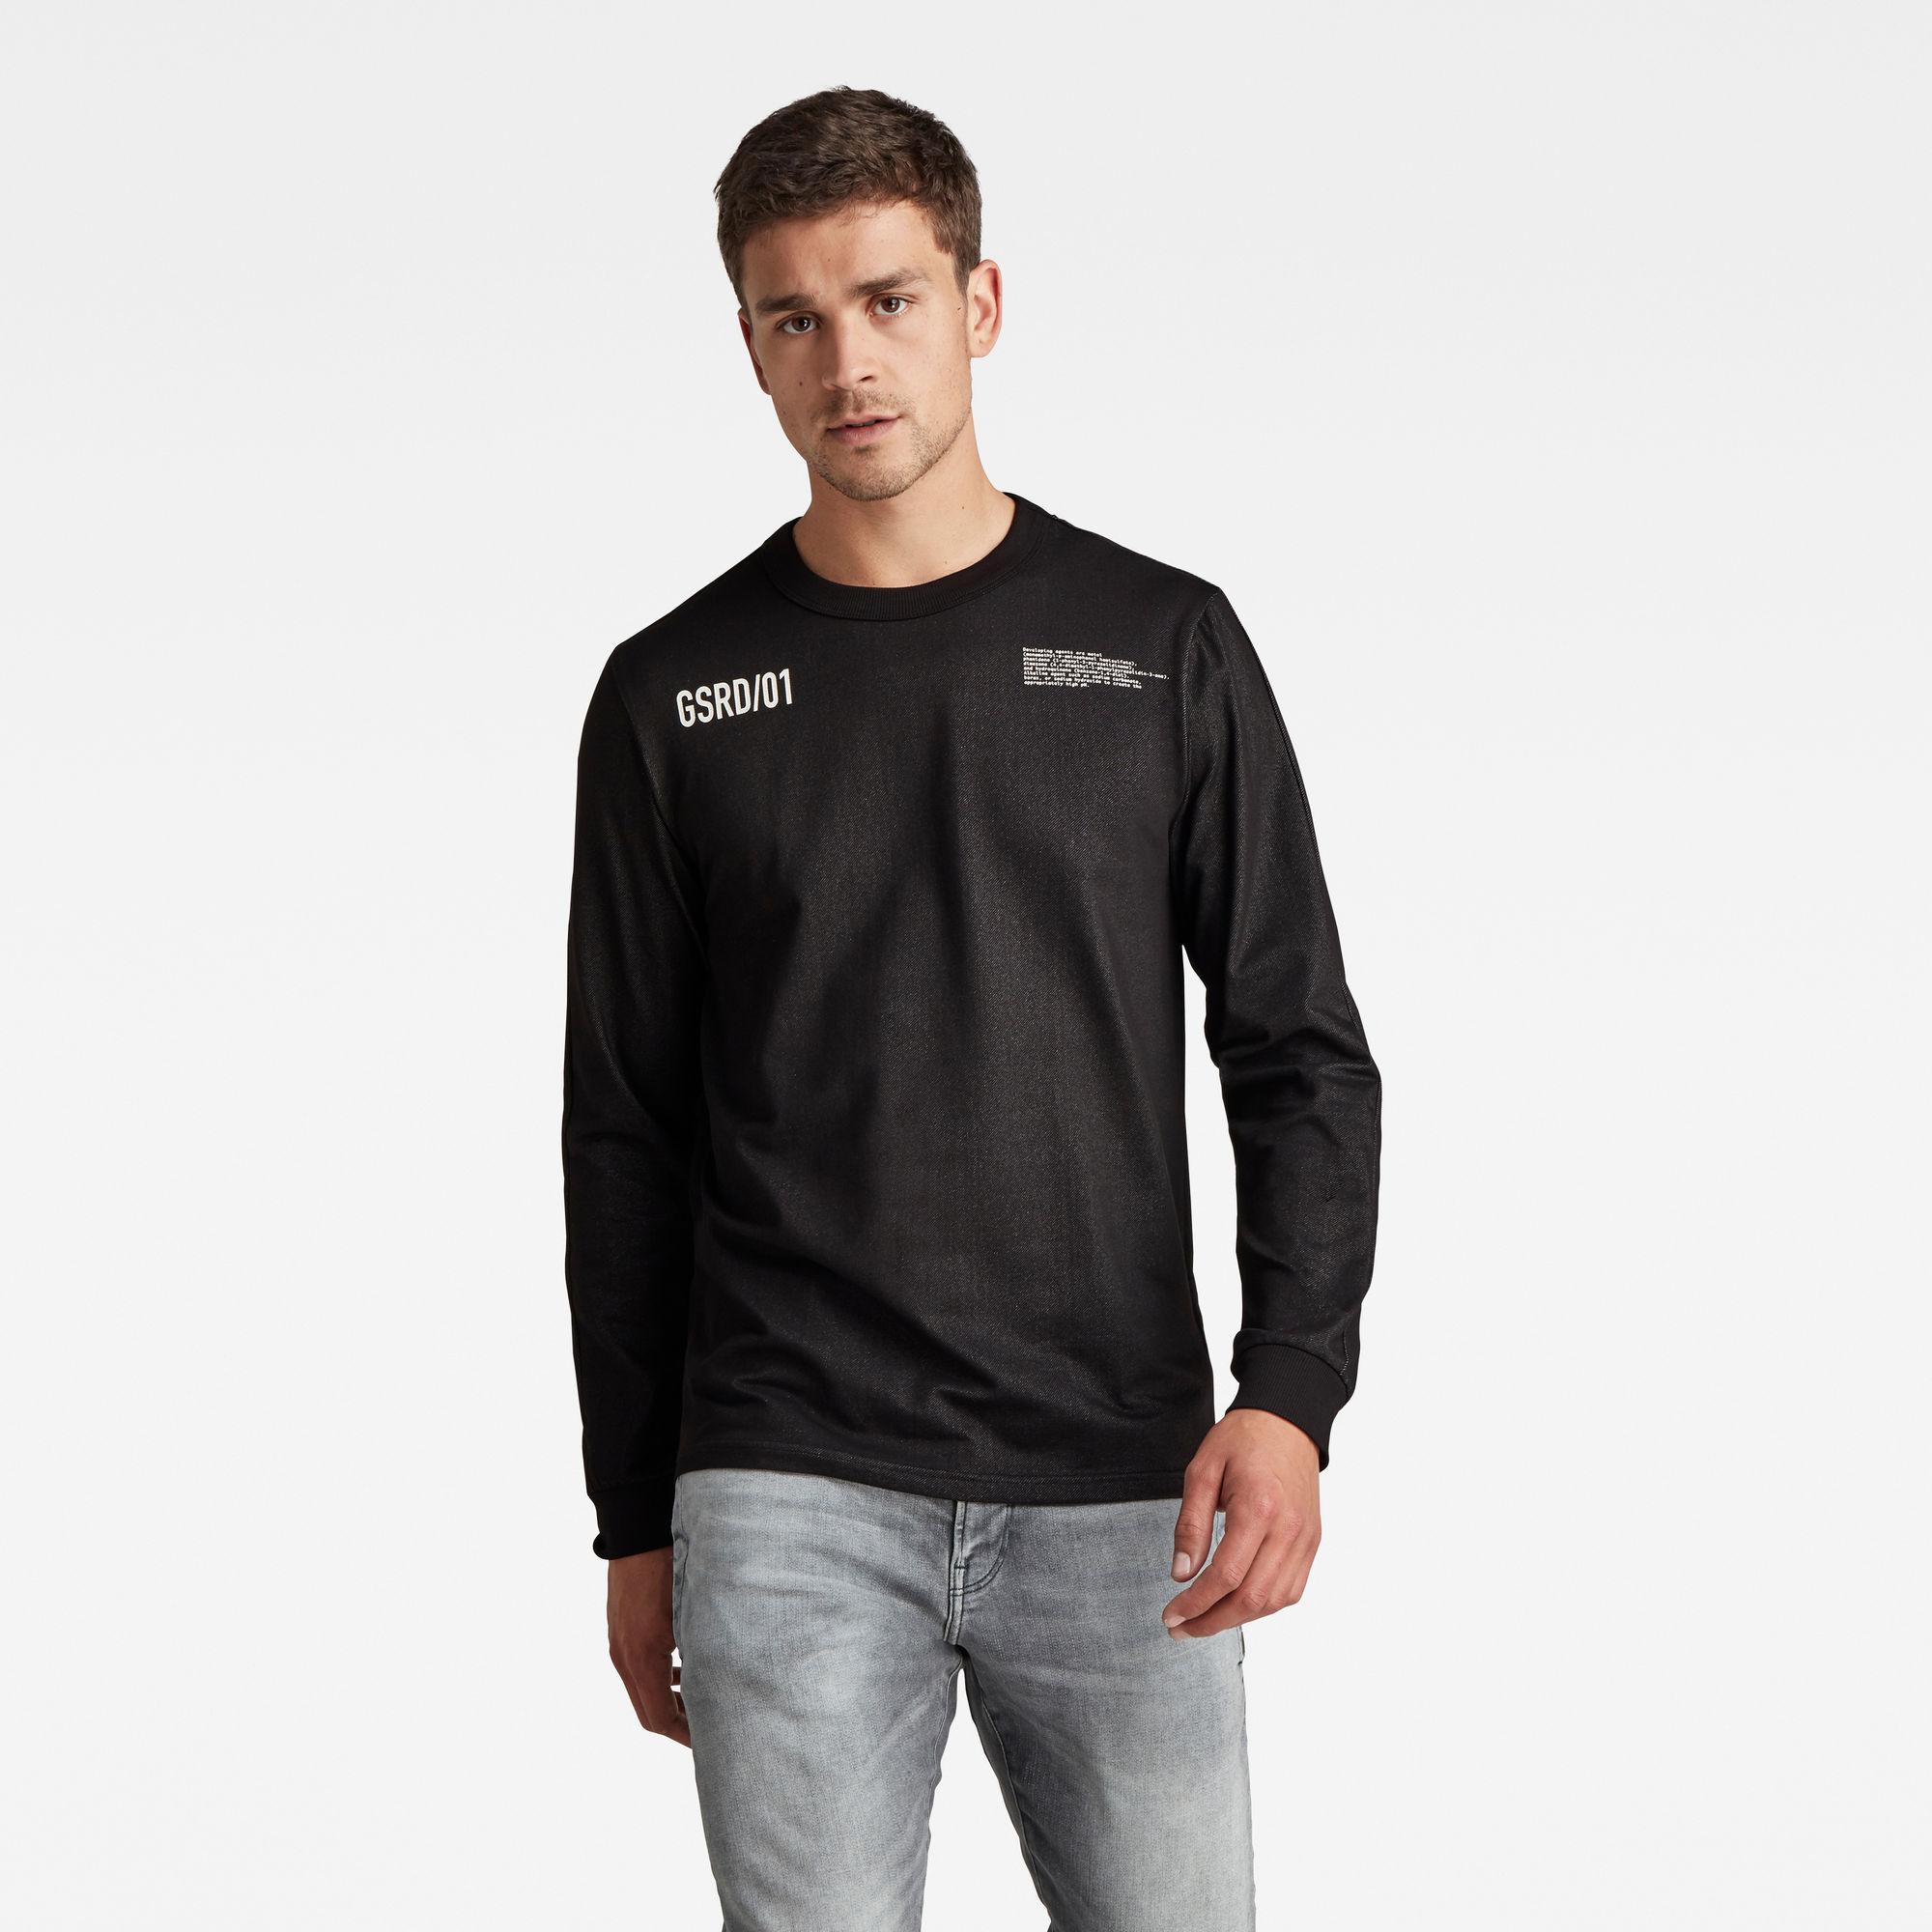 G-star RAW Hommes T-shirt Text Tweeter Noir  - Taille: L S XXL XS XL M